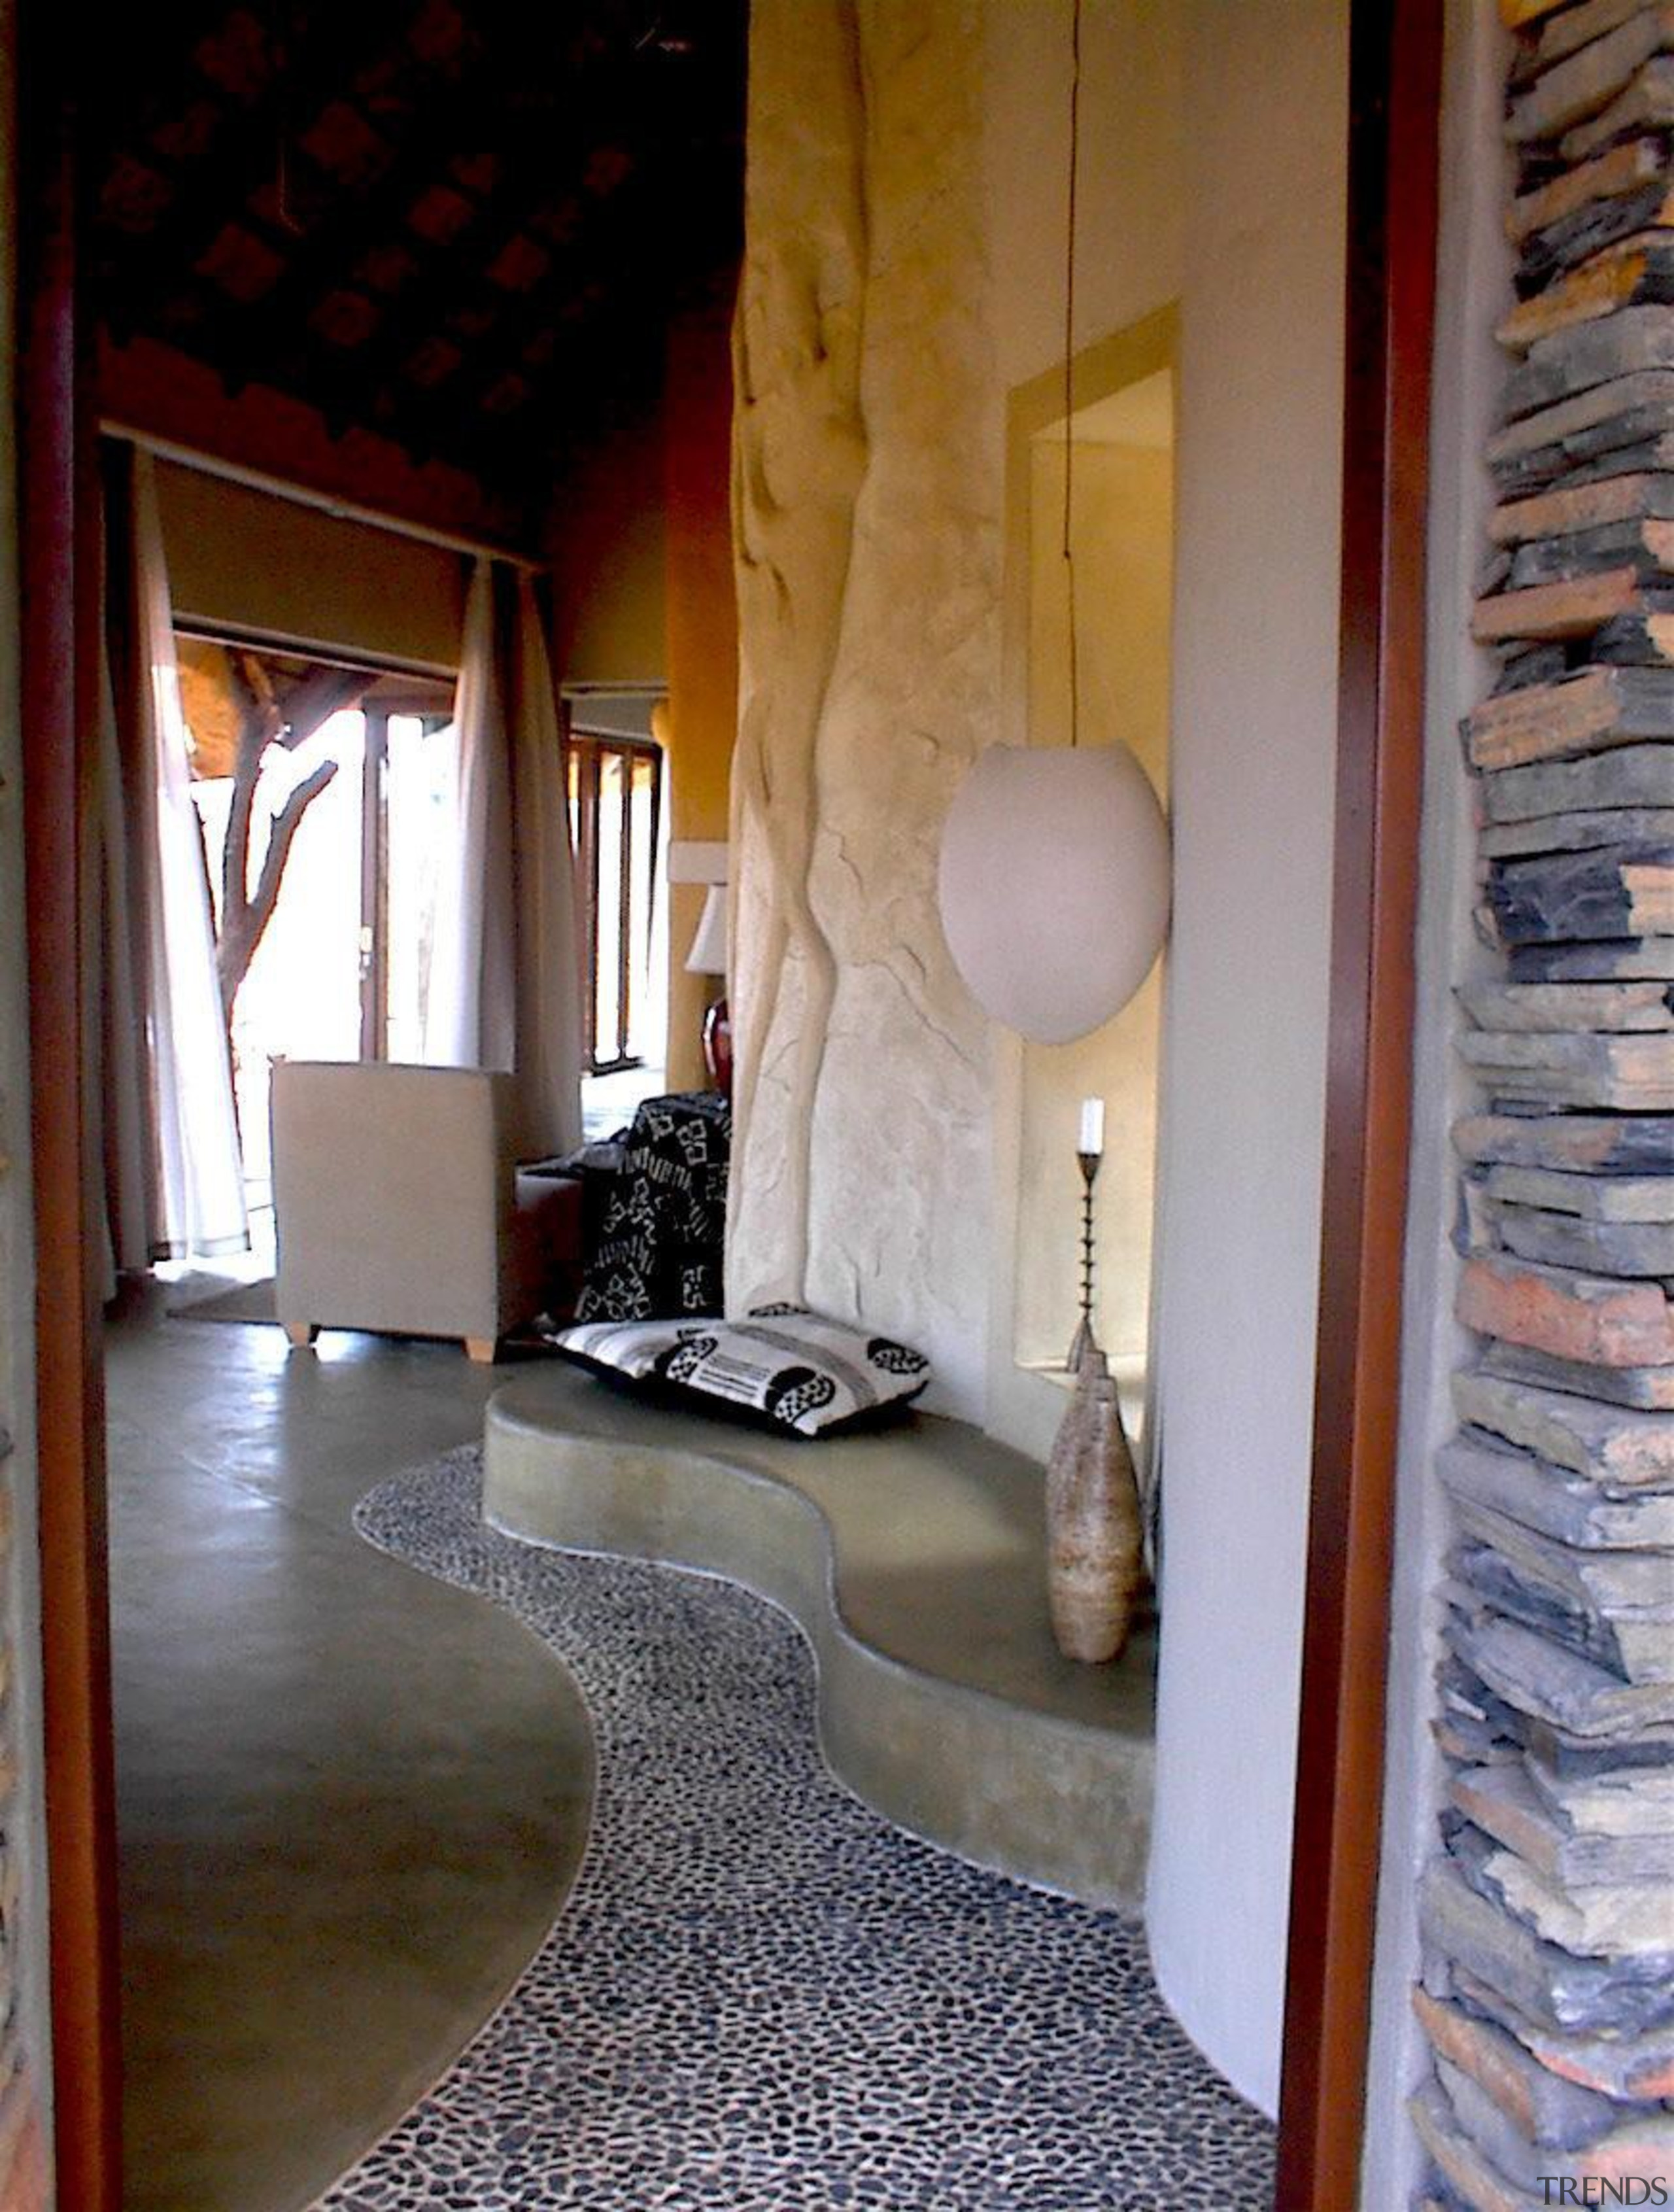 Micro topping 15 - Micro_topping_15 - ceiling   ceiling, floor, flooring, furniture, home, interior design, living room, loft, property, room, wall, gray